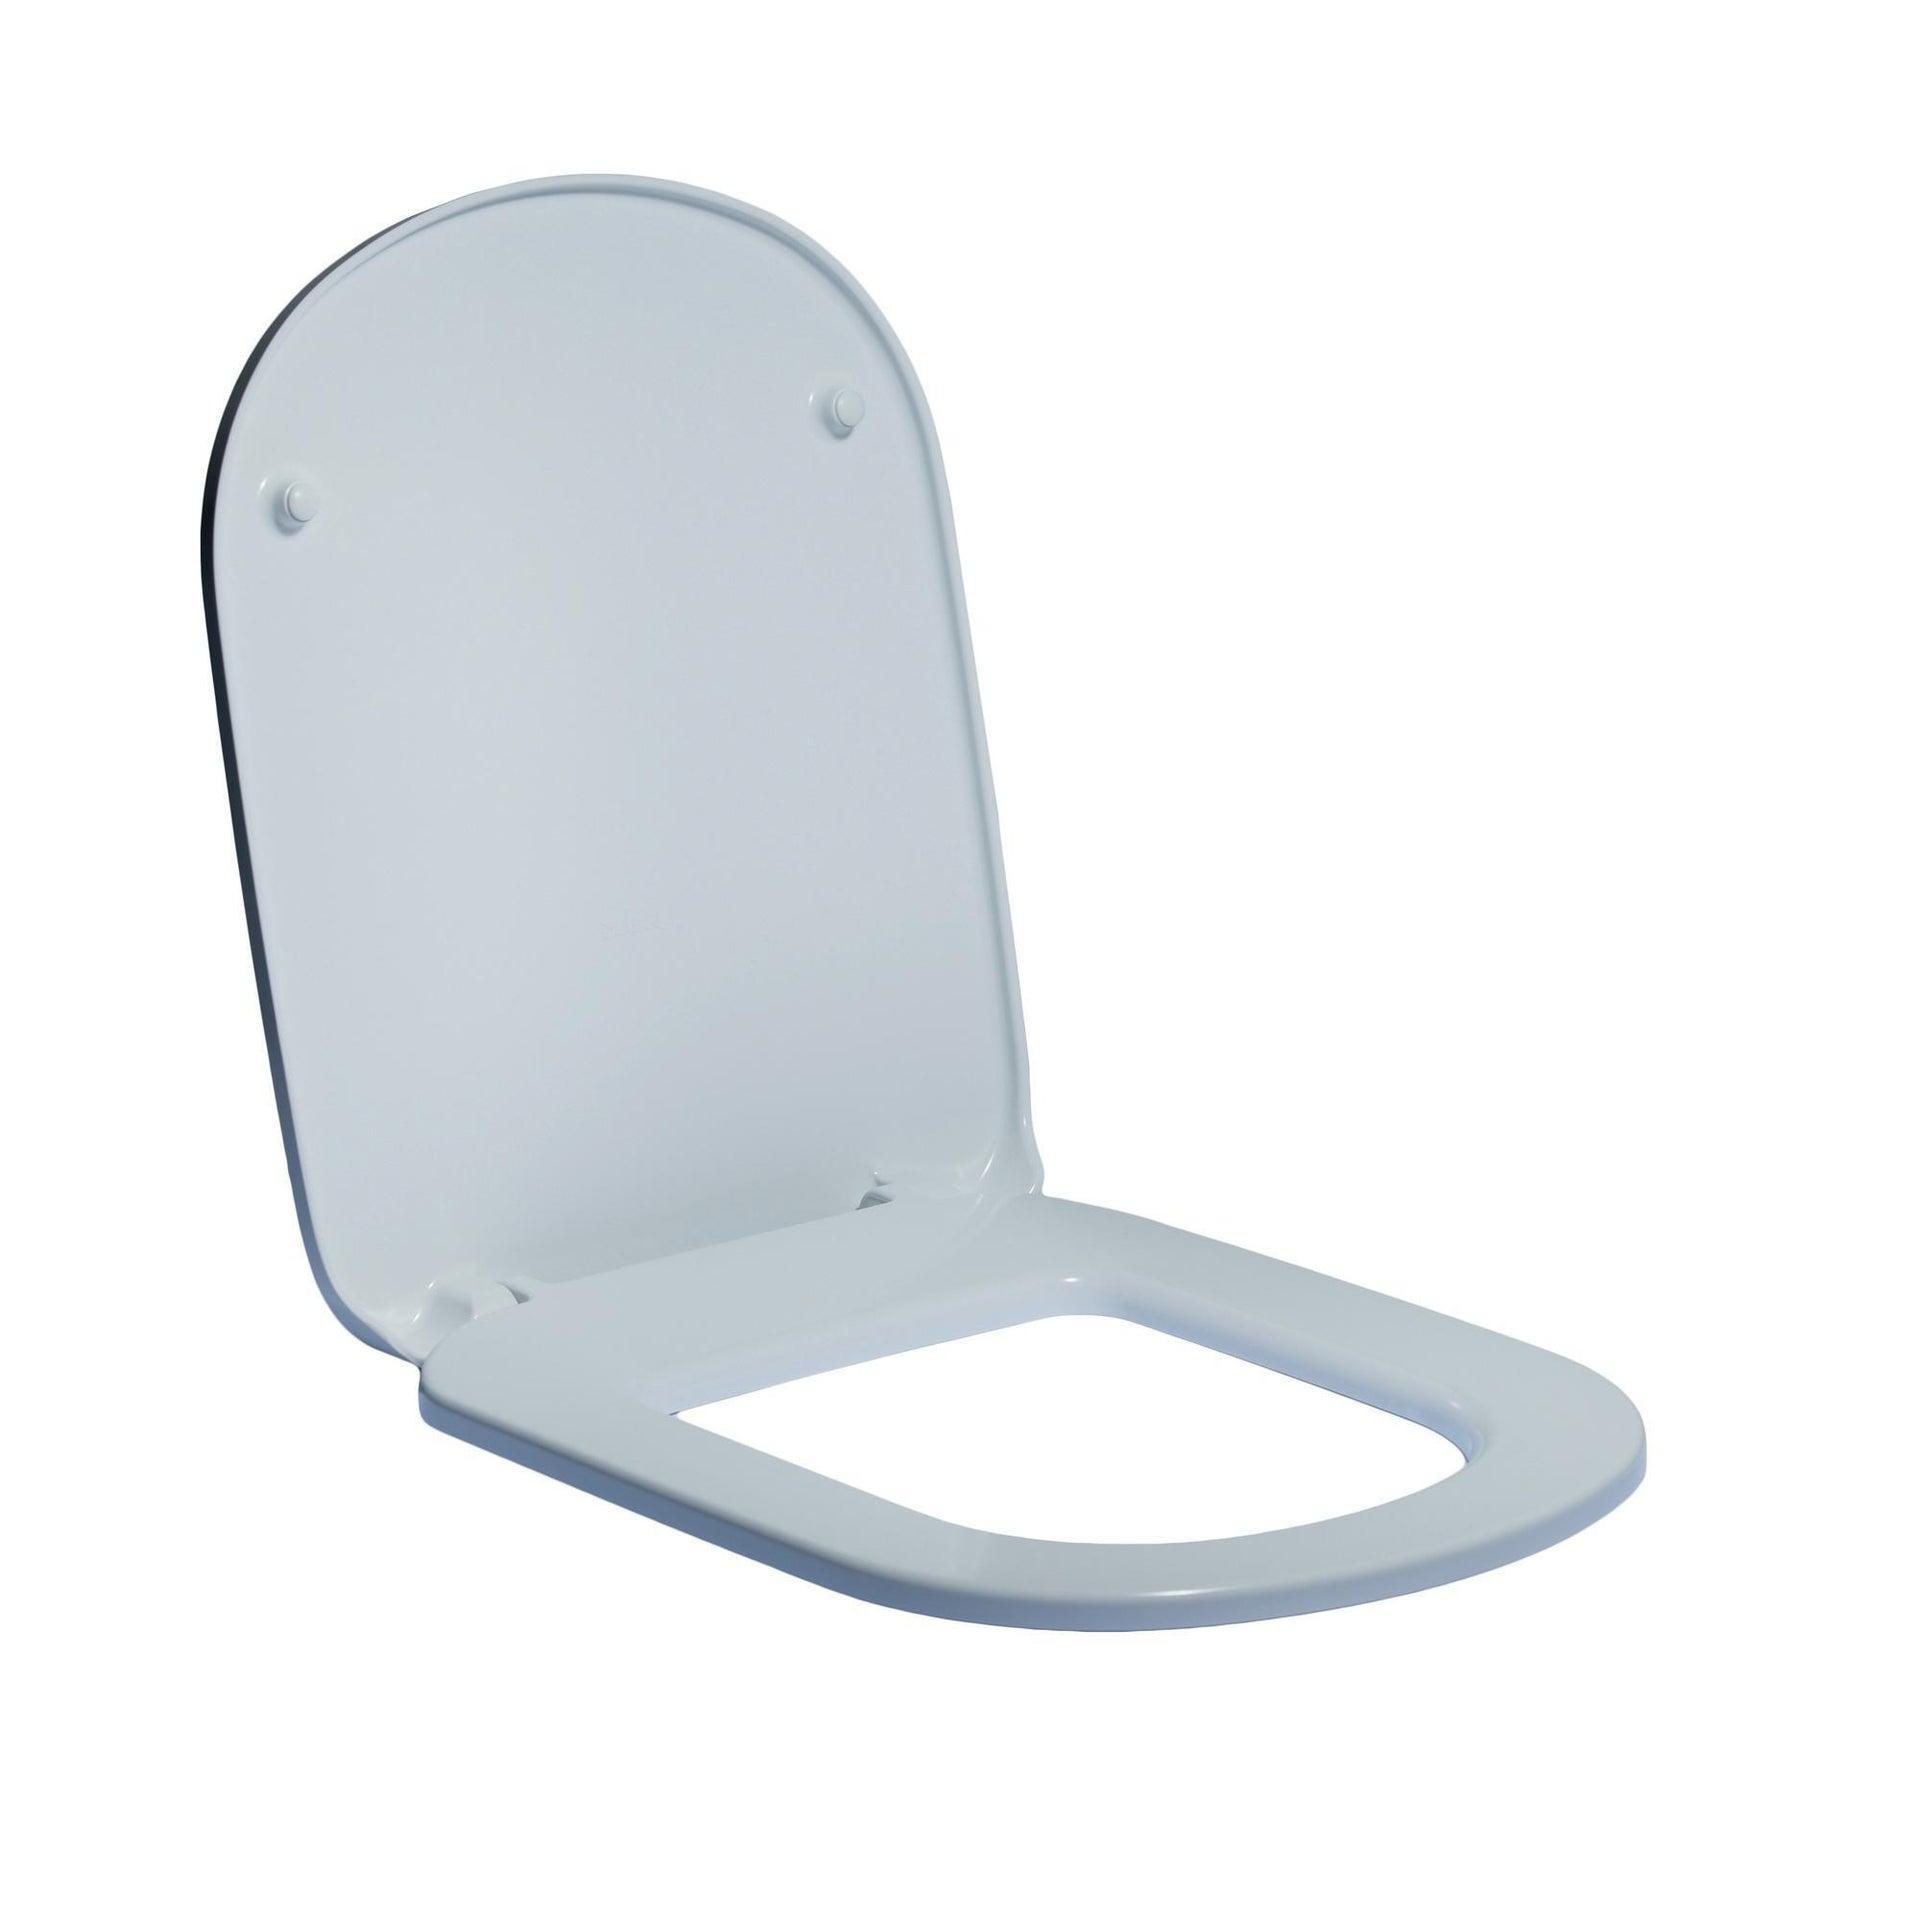 Copriwater ovale Originale per serie sanitari Gemma 2 IDEAL STANDARD termoindurente bianco - 4